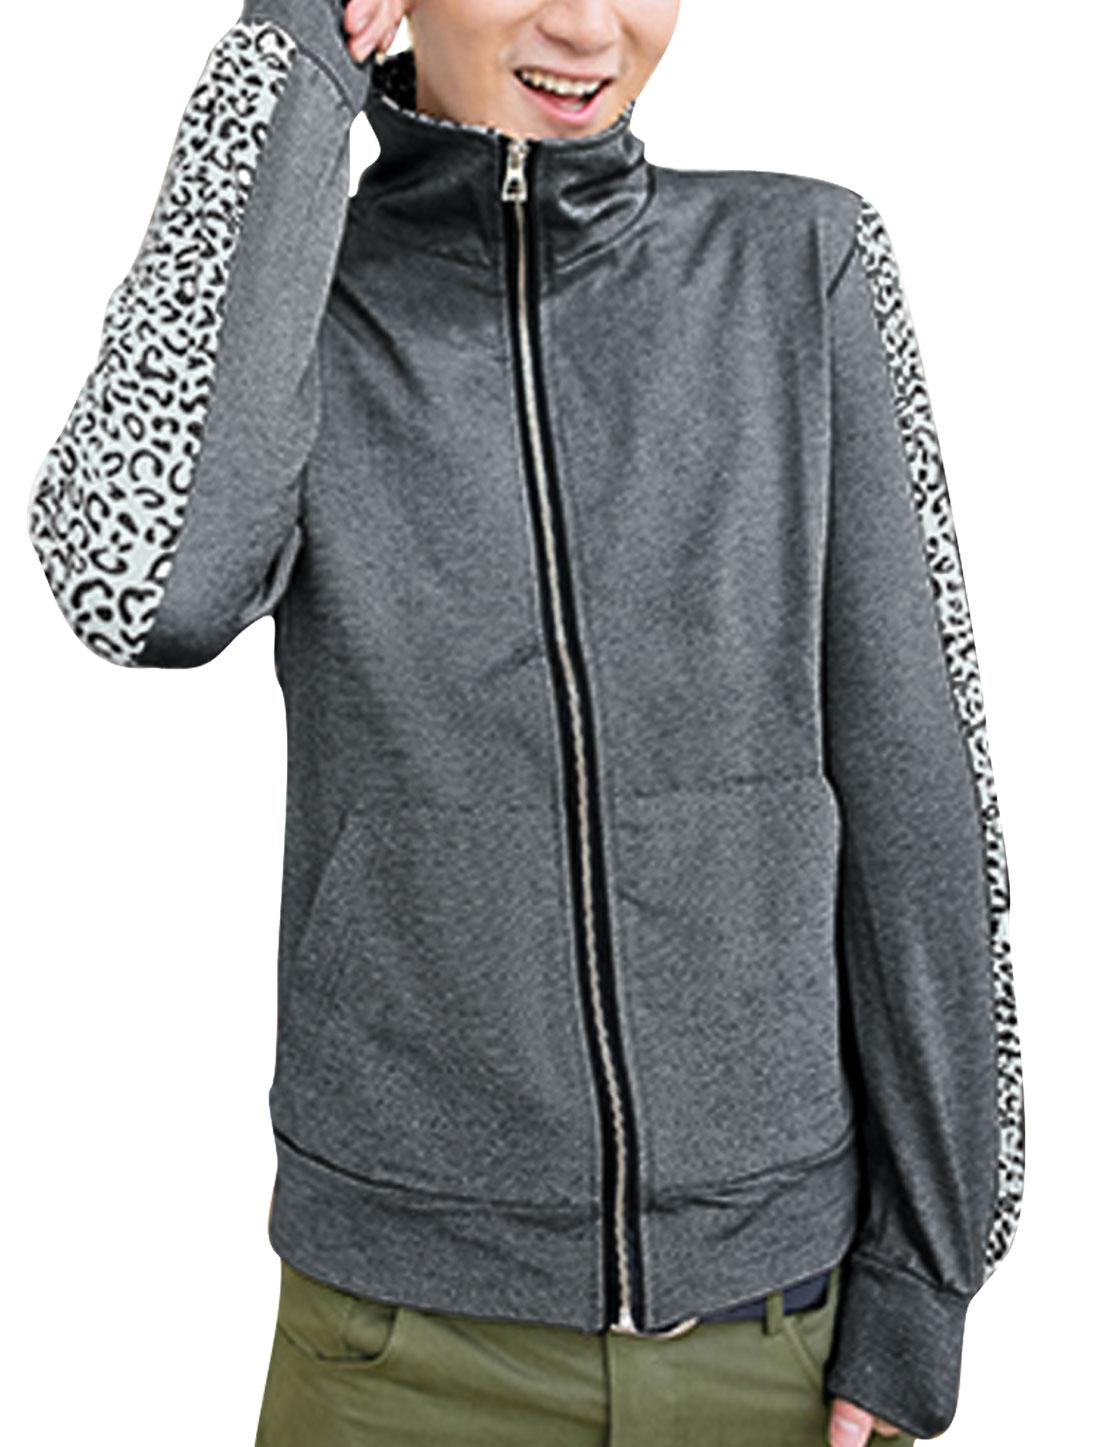 Men Leopard Print Long Sleeves Full Zip-Up Jacket Dark Gray M